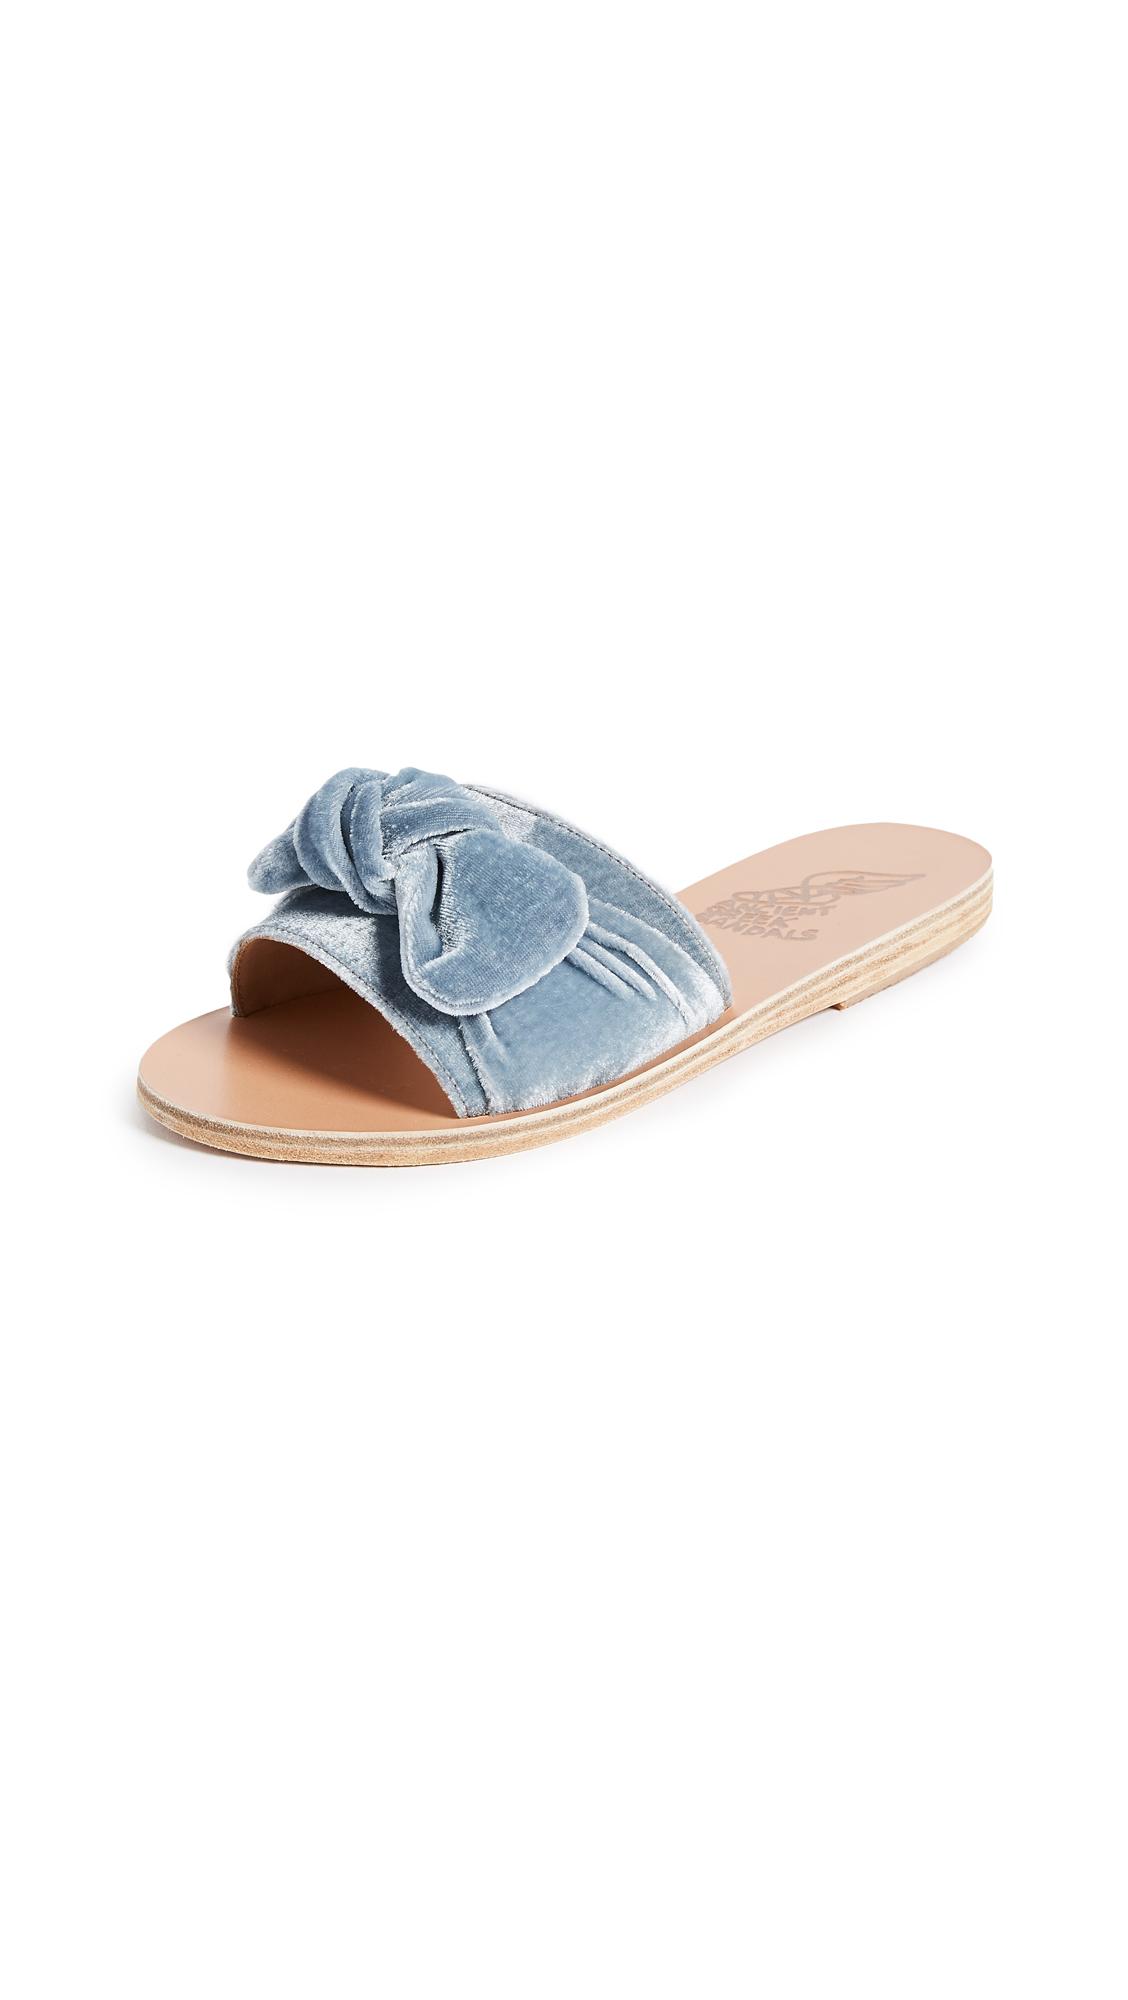 Ancient Greek Sandals Taygete Bow Slide Sandals - Azur